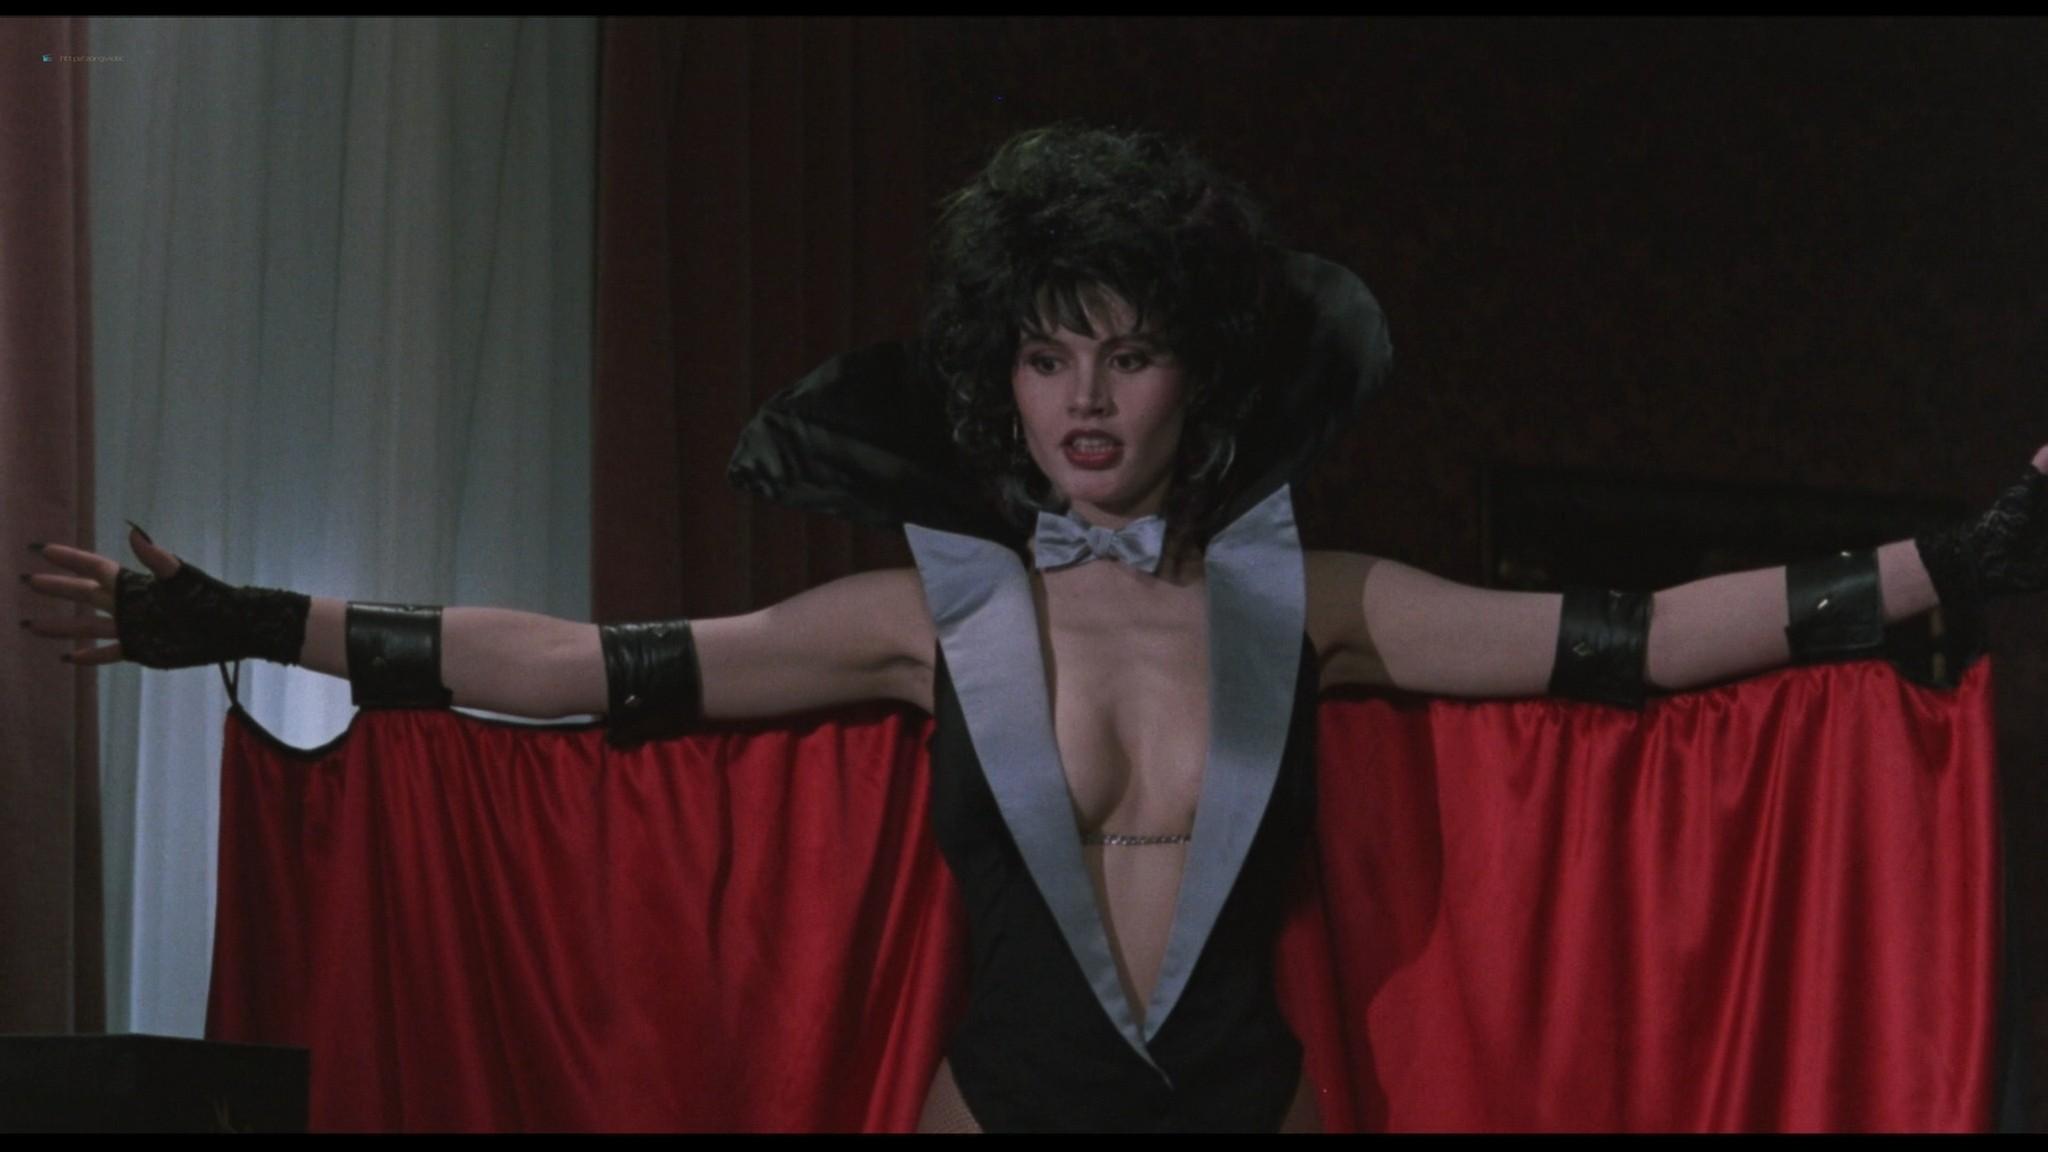 Geena Davis hot and sexy Ksenia Prohaska sexy - Transylvania 6-5000 (1985) HD 1080p BluRay (18)